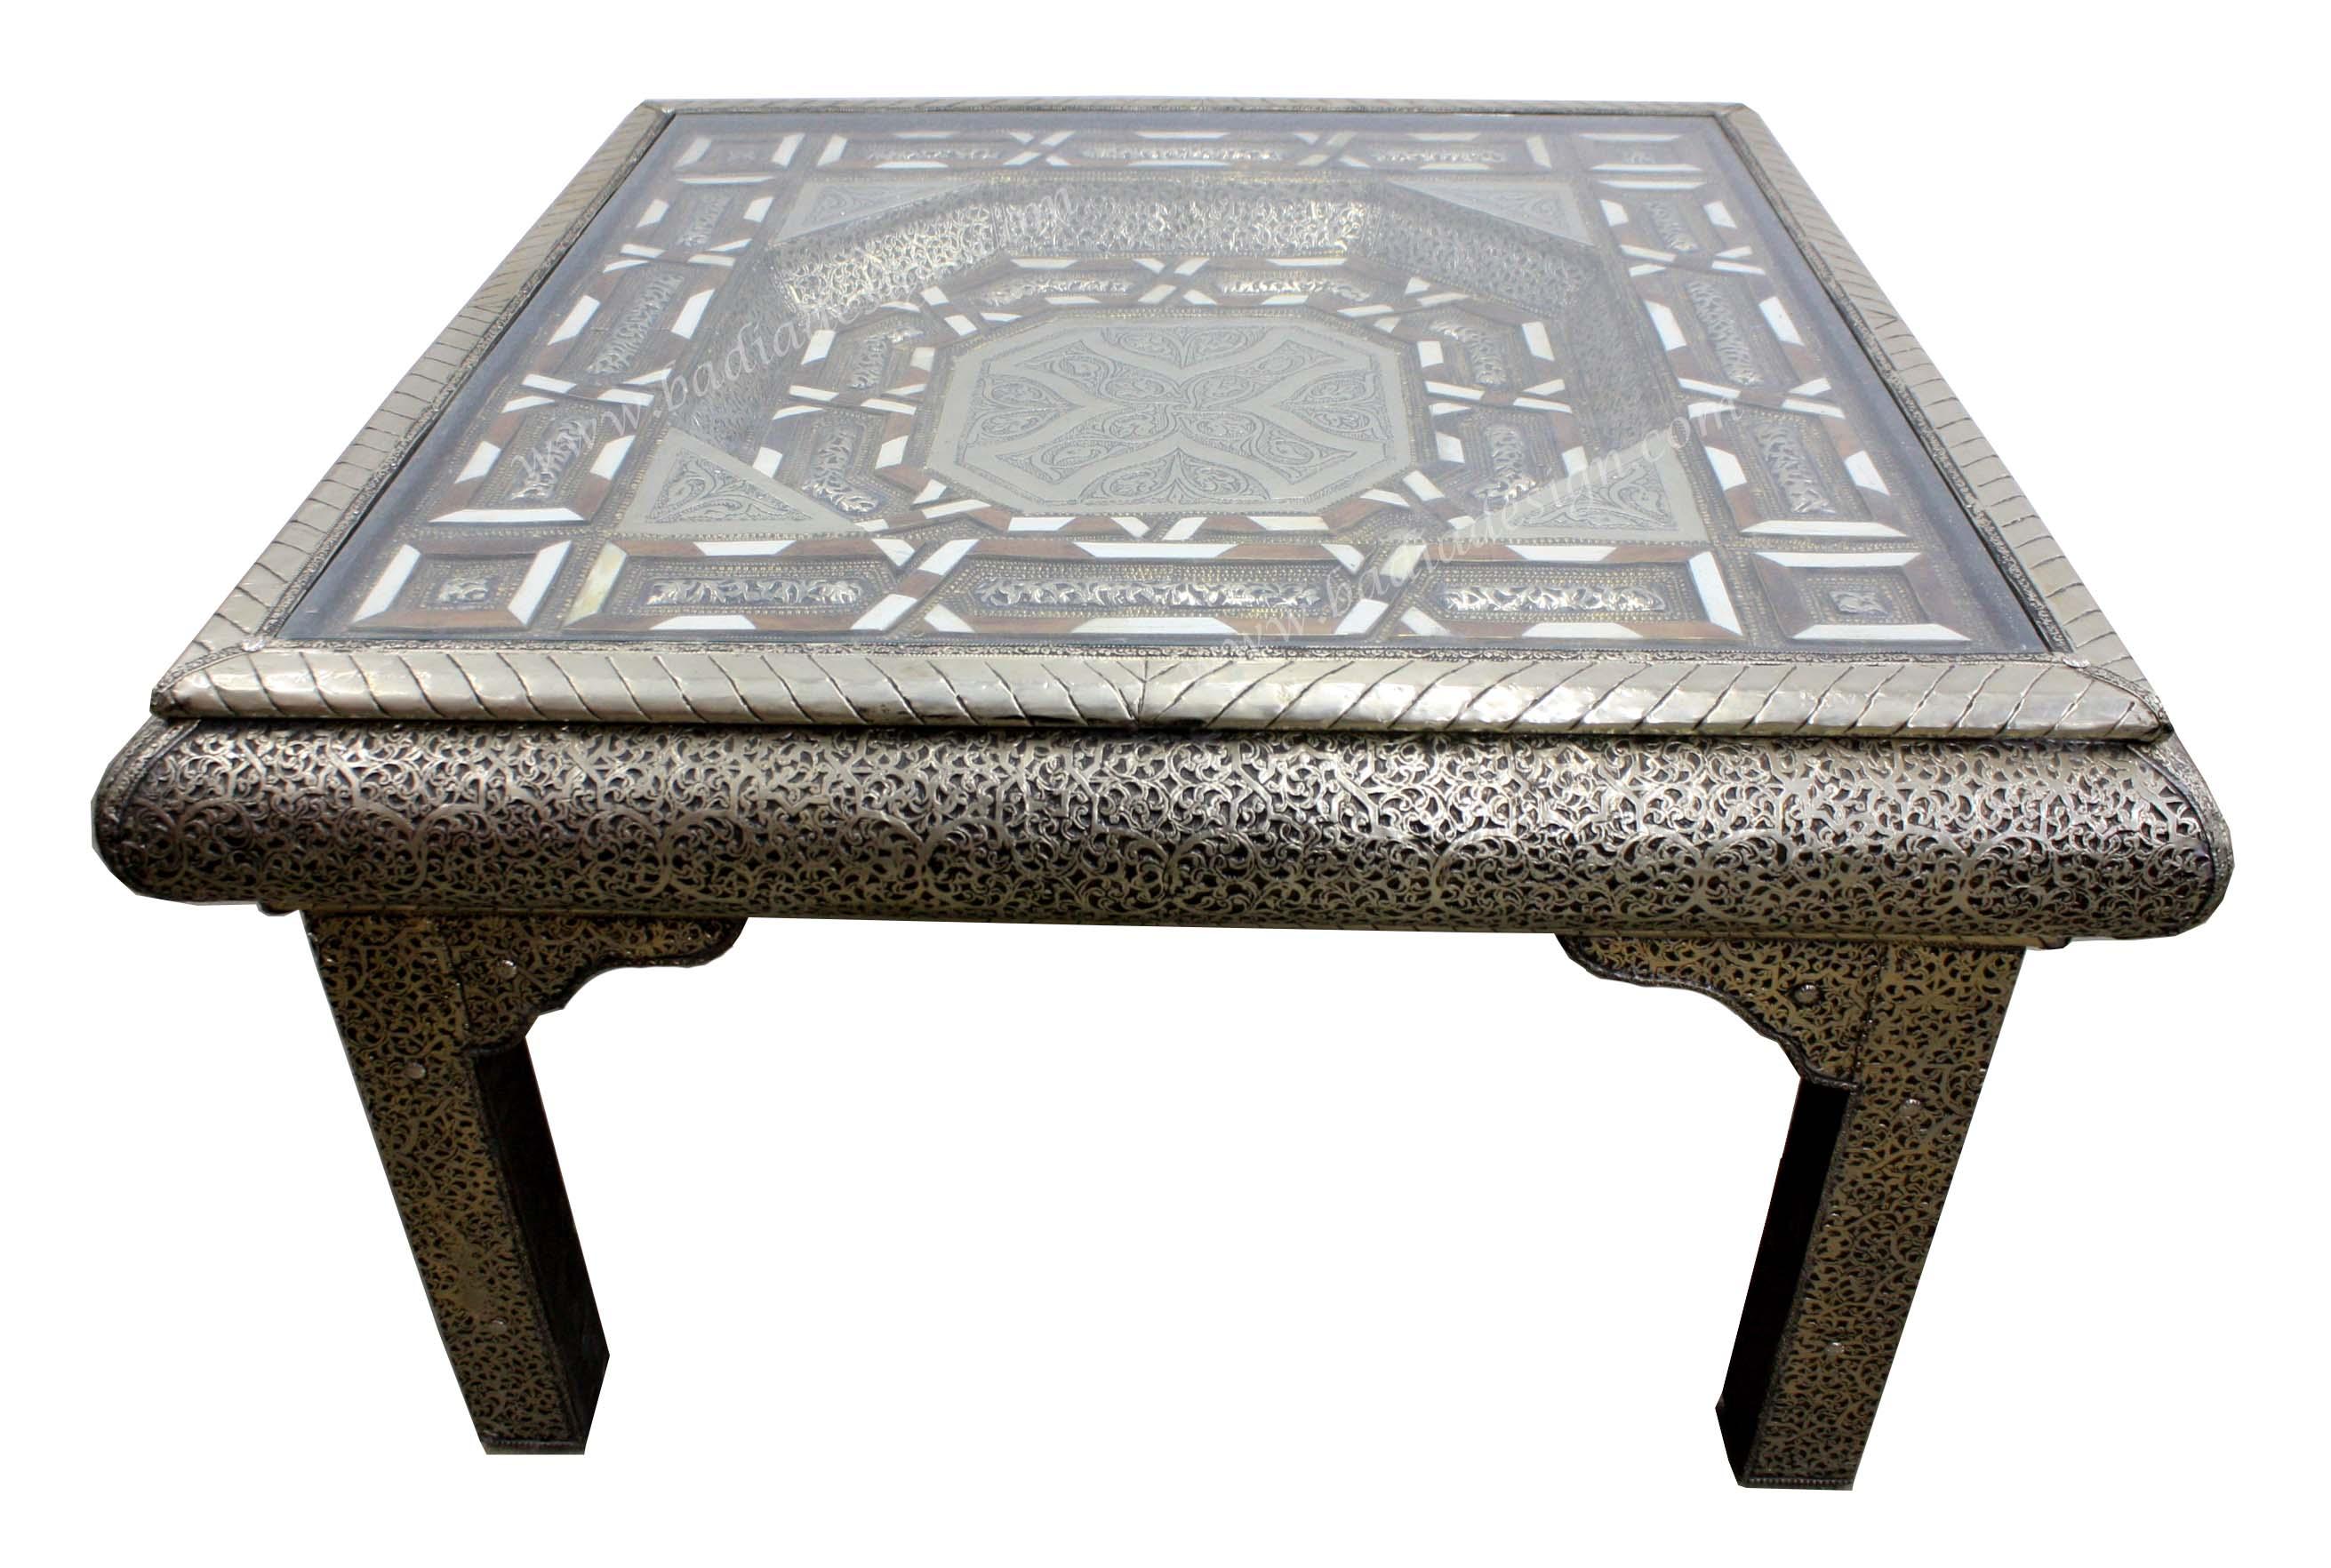 high-end-furniture-los-angeles-mb-st069-1.jpg